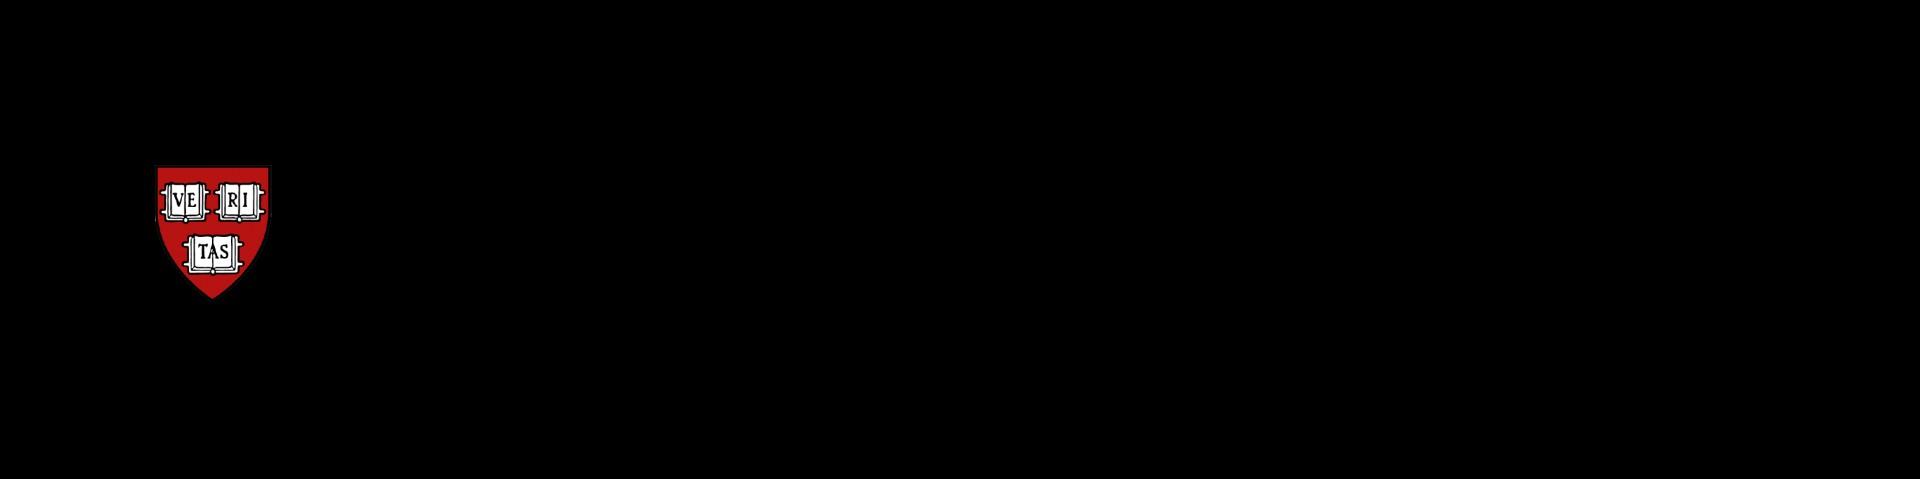 023 Bok Logo Harvard Left Shield Black Original 1 Why Do You Want To Teacher Essay Impressive Be A Pdf Become An English Home Based Online 1920